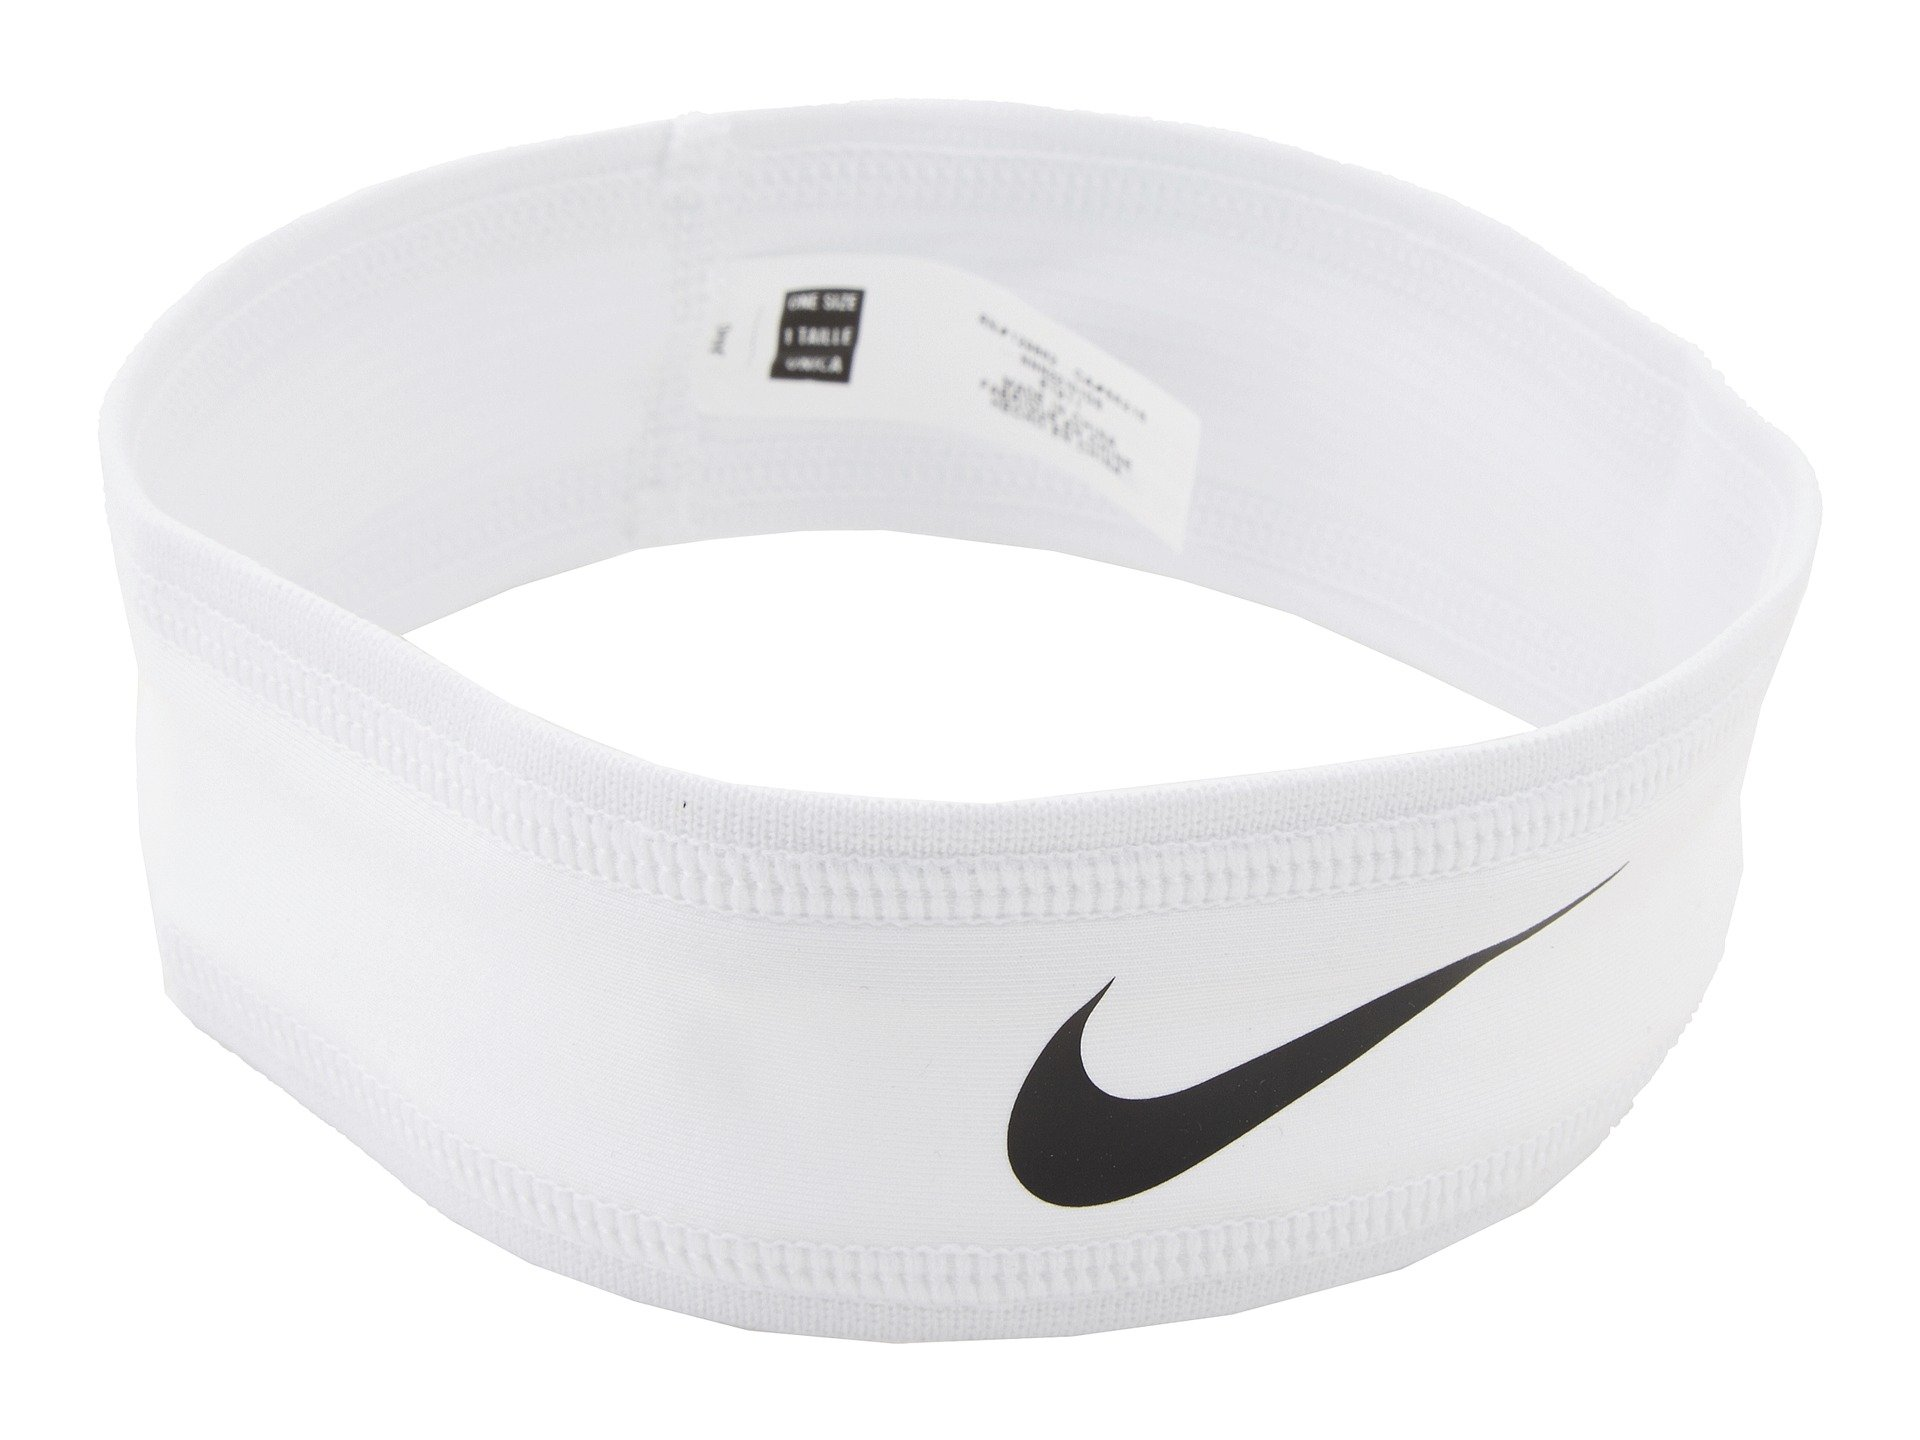 Nike Speed Performance Headband (One Size Fits Most, White/Black)